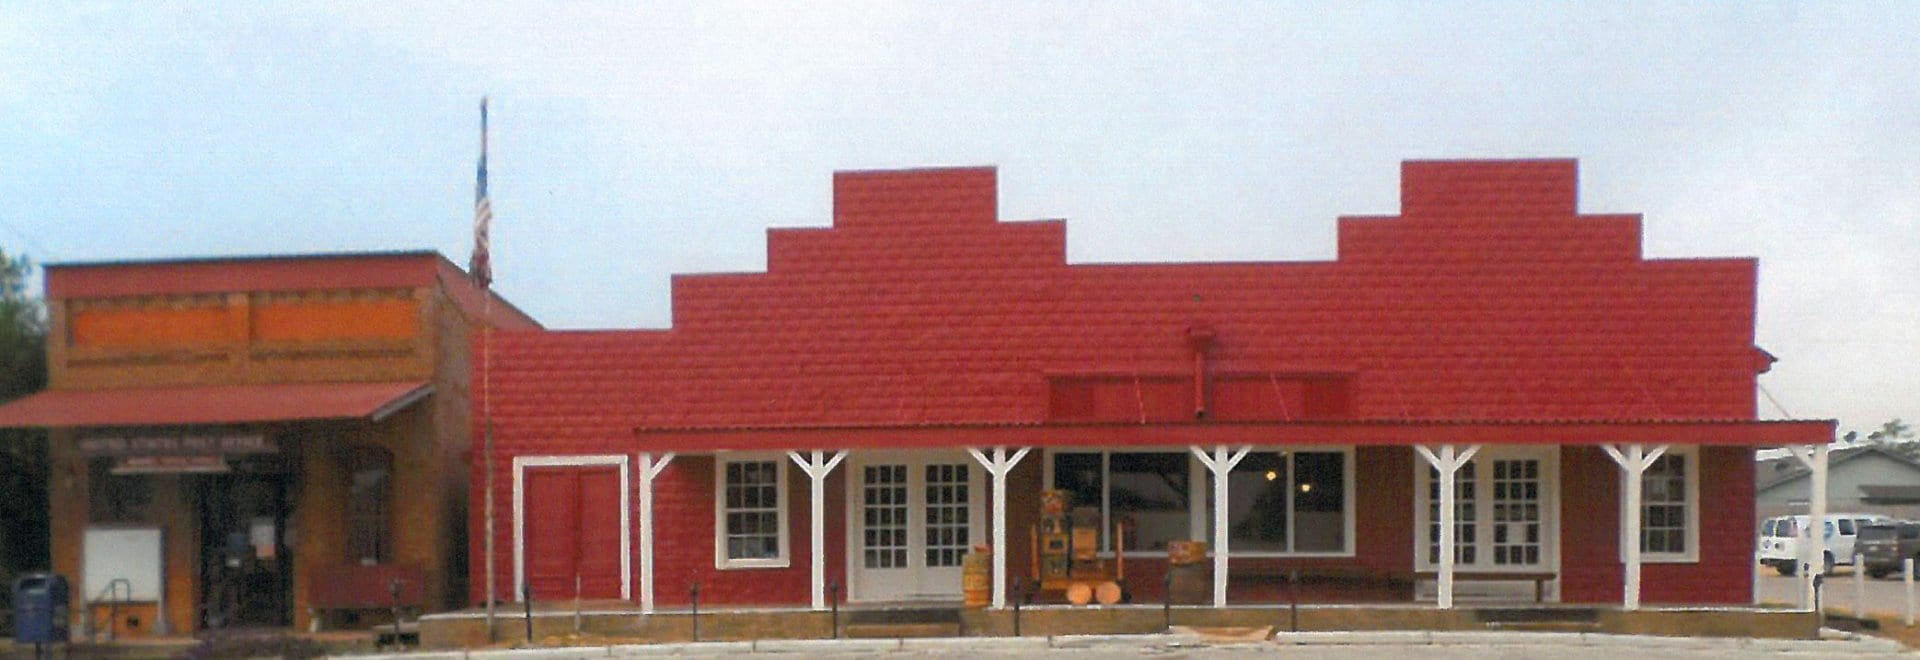 Restored Historic Buildings